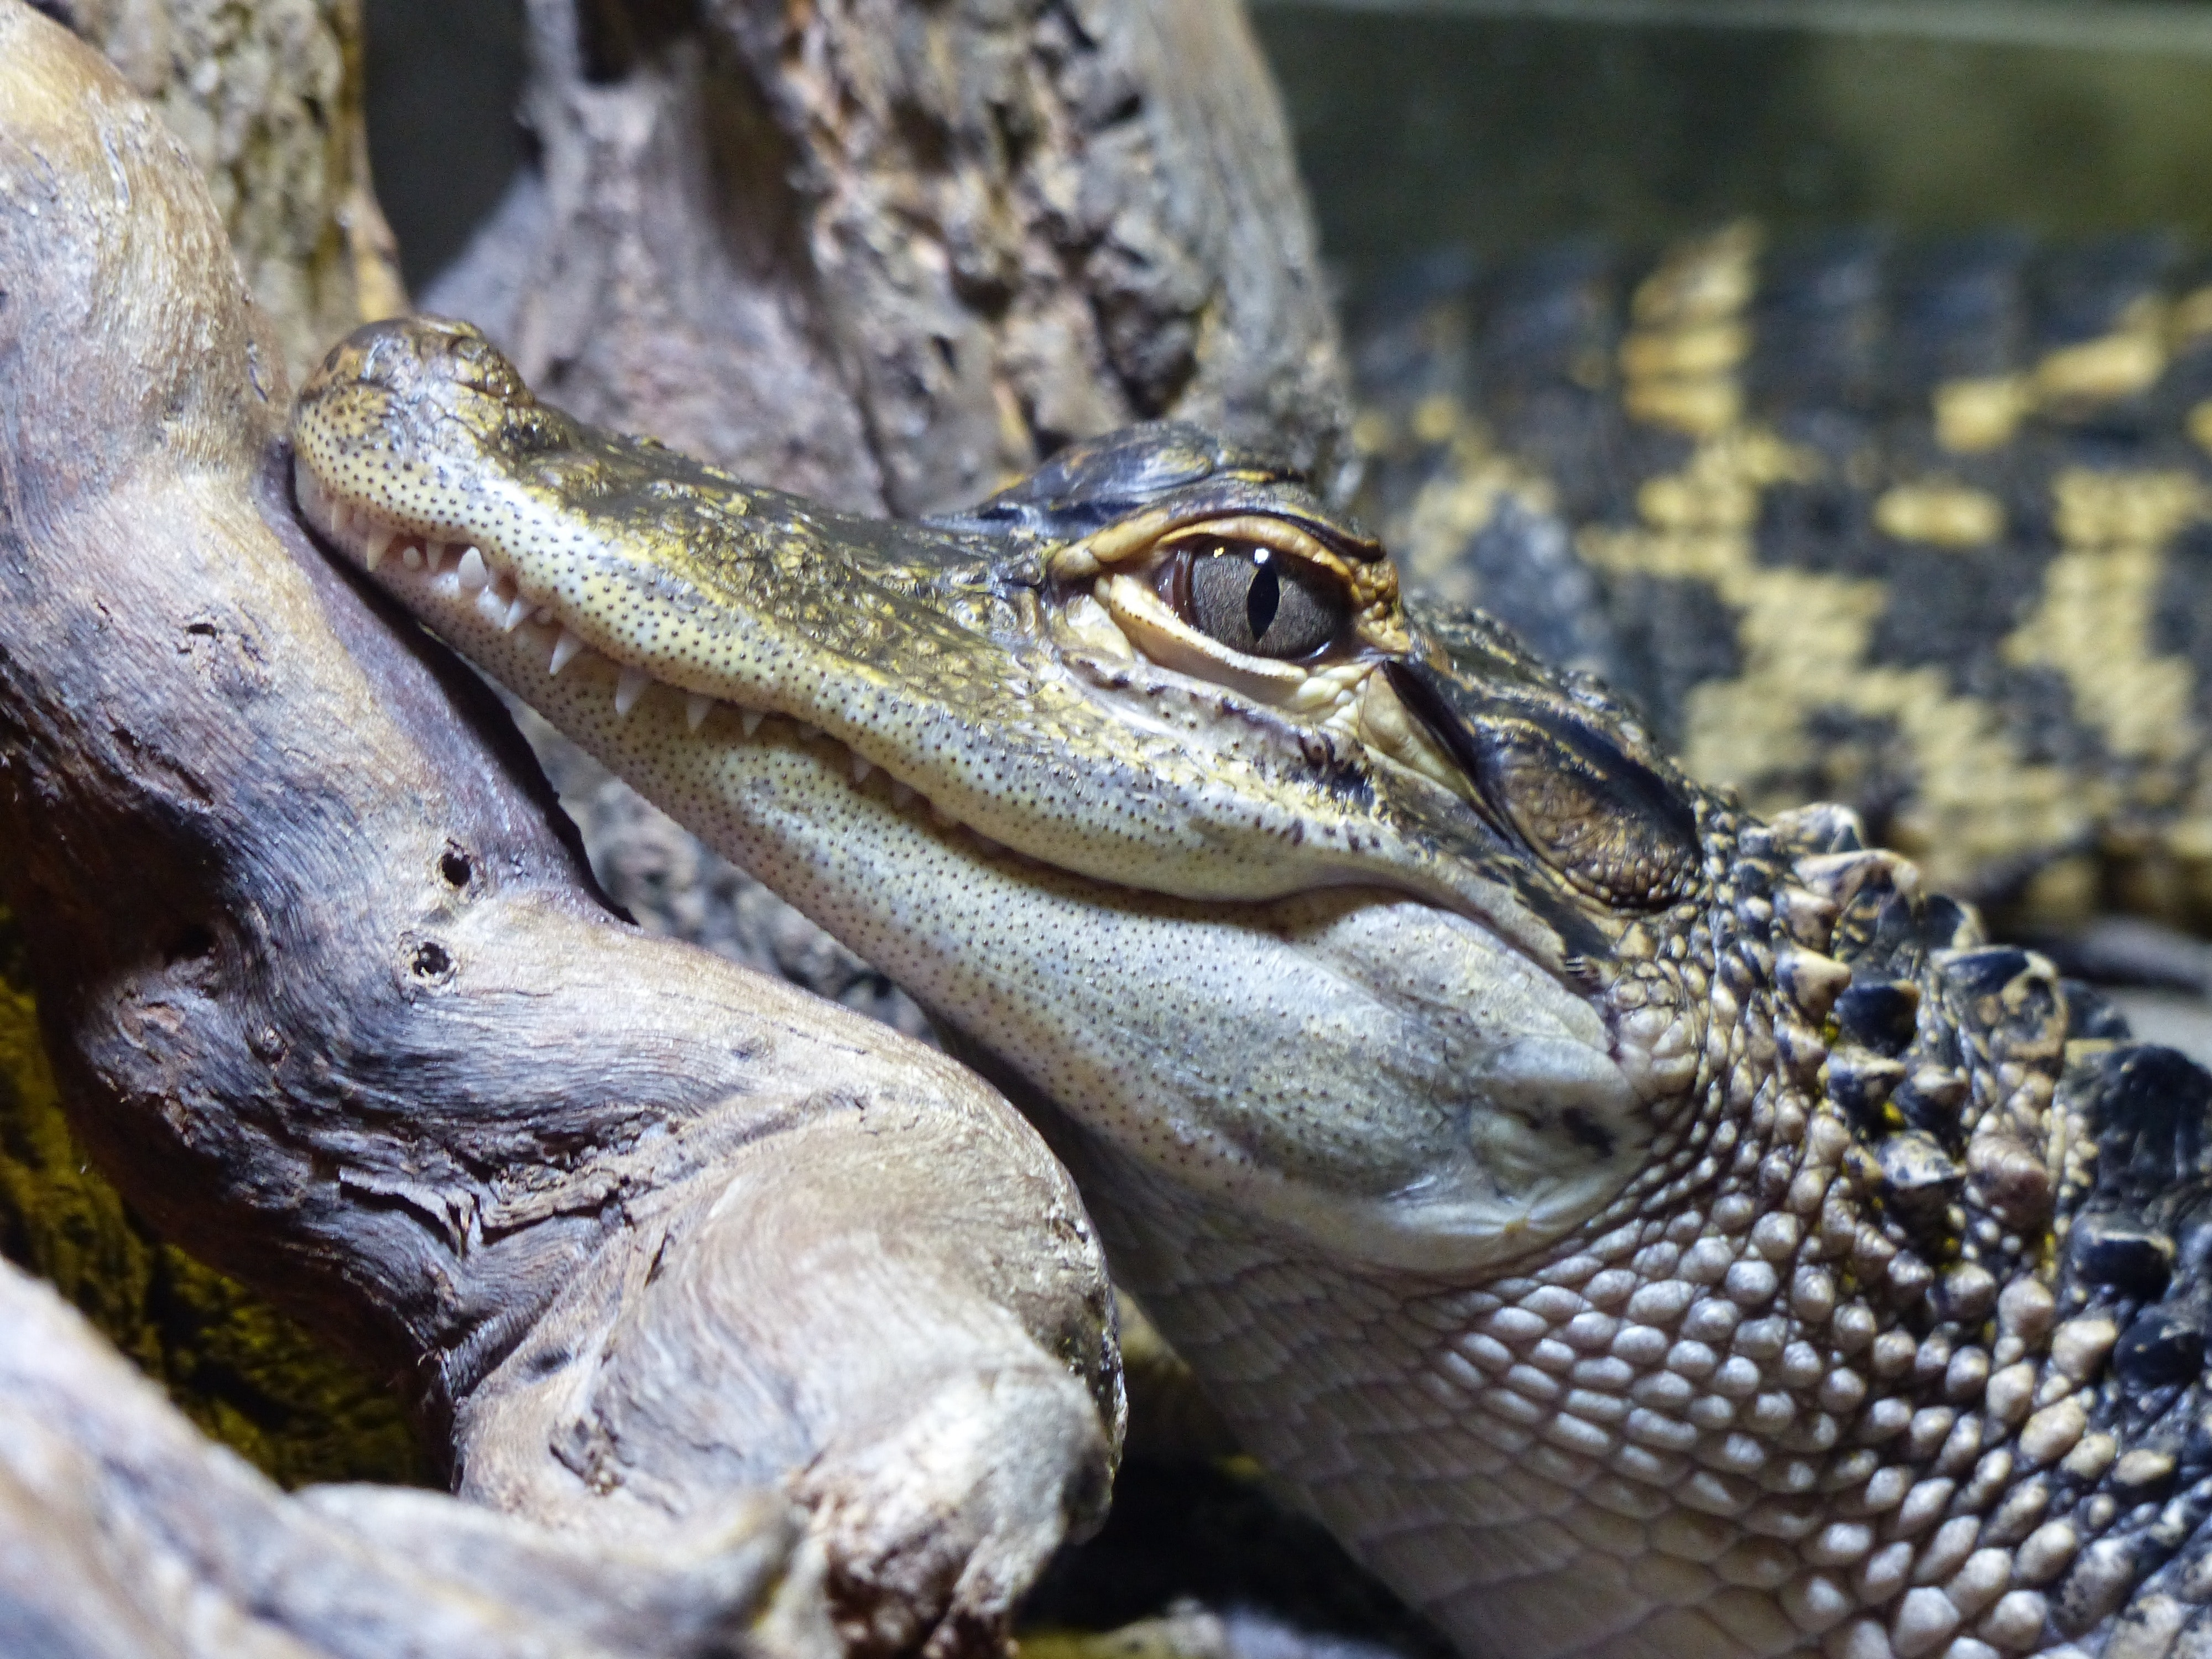 Close-up of Crocodile, Portrait, Wood, Wildlife, Wilderness, HQ Photo